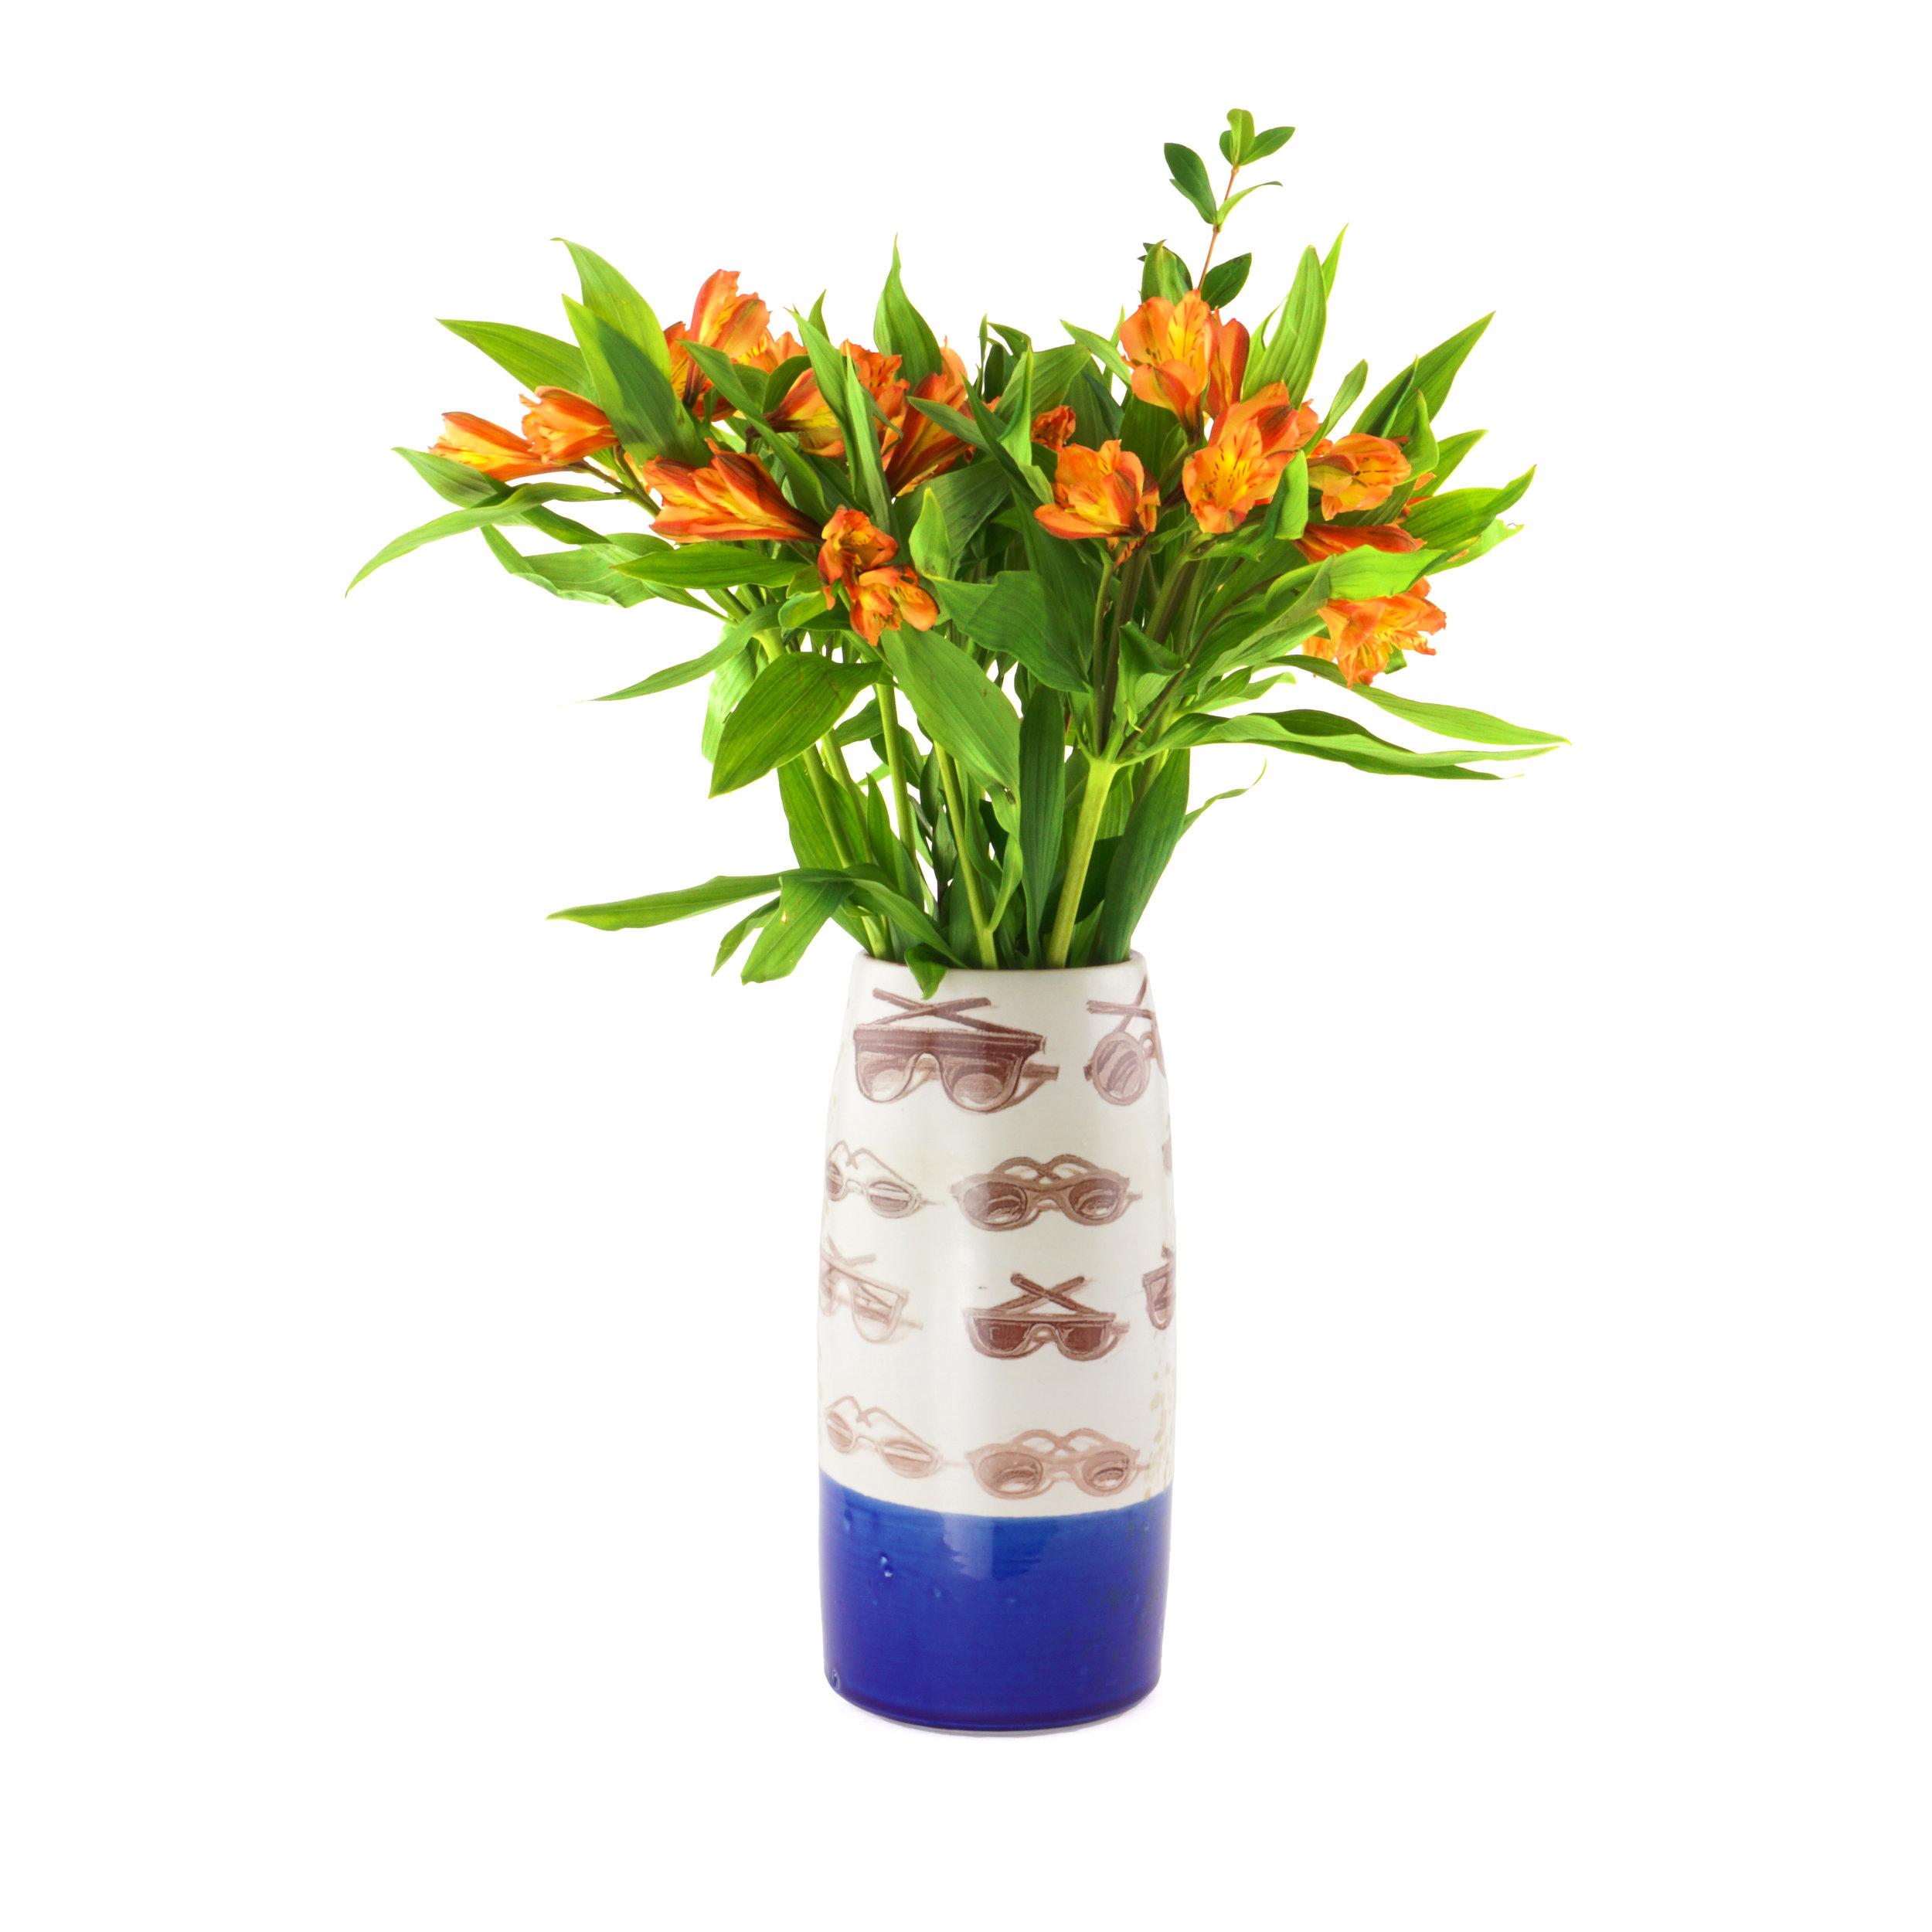 sunglasses vase flowers.jpg